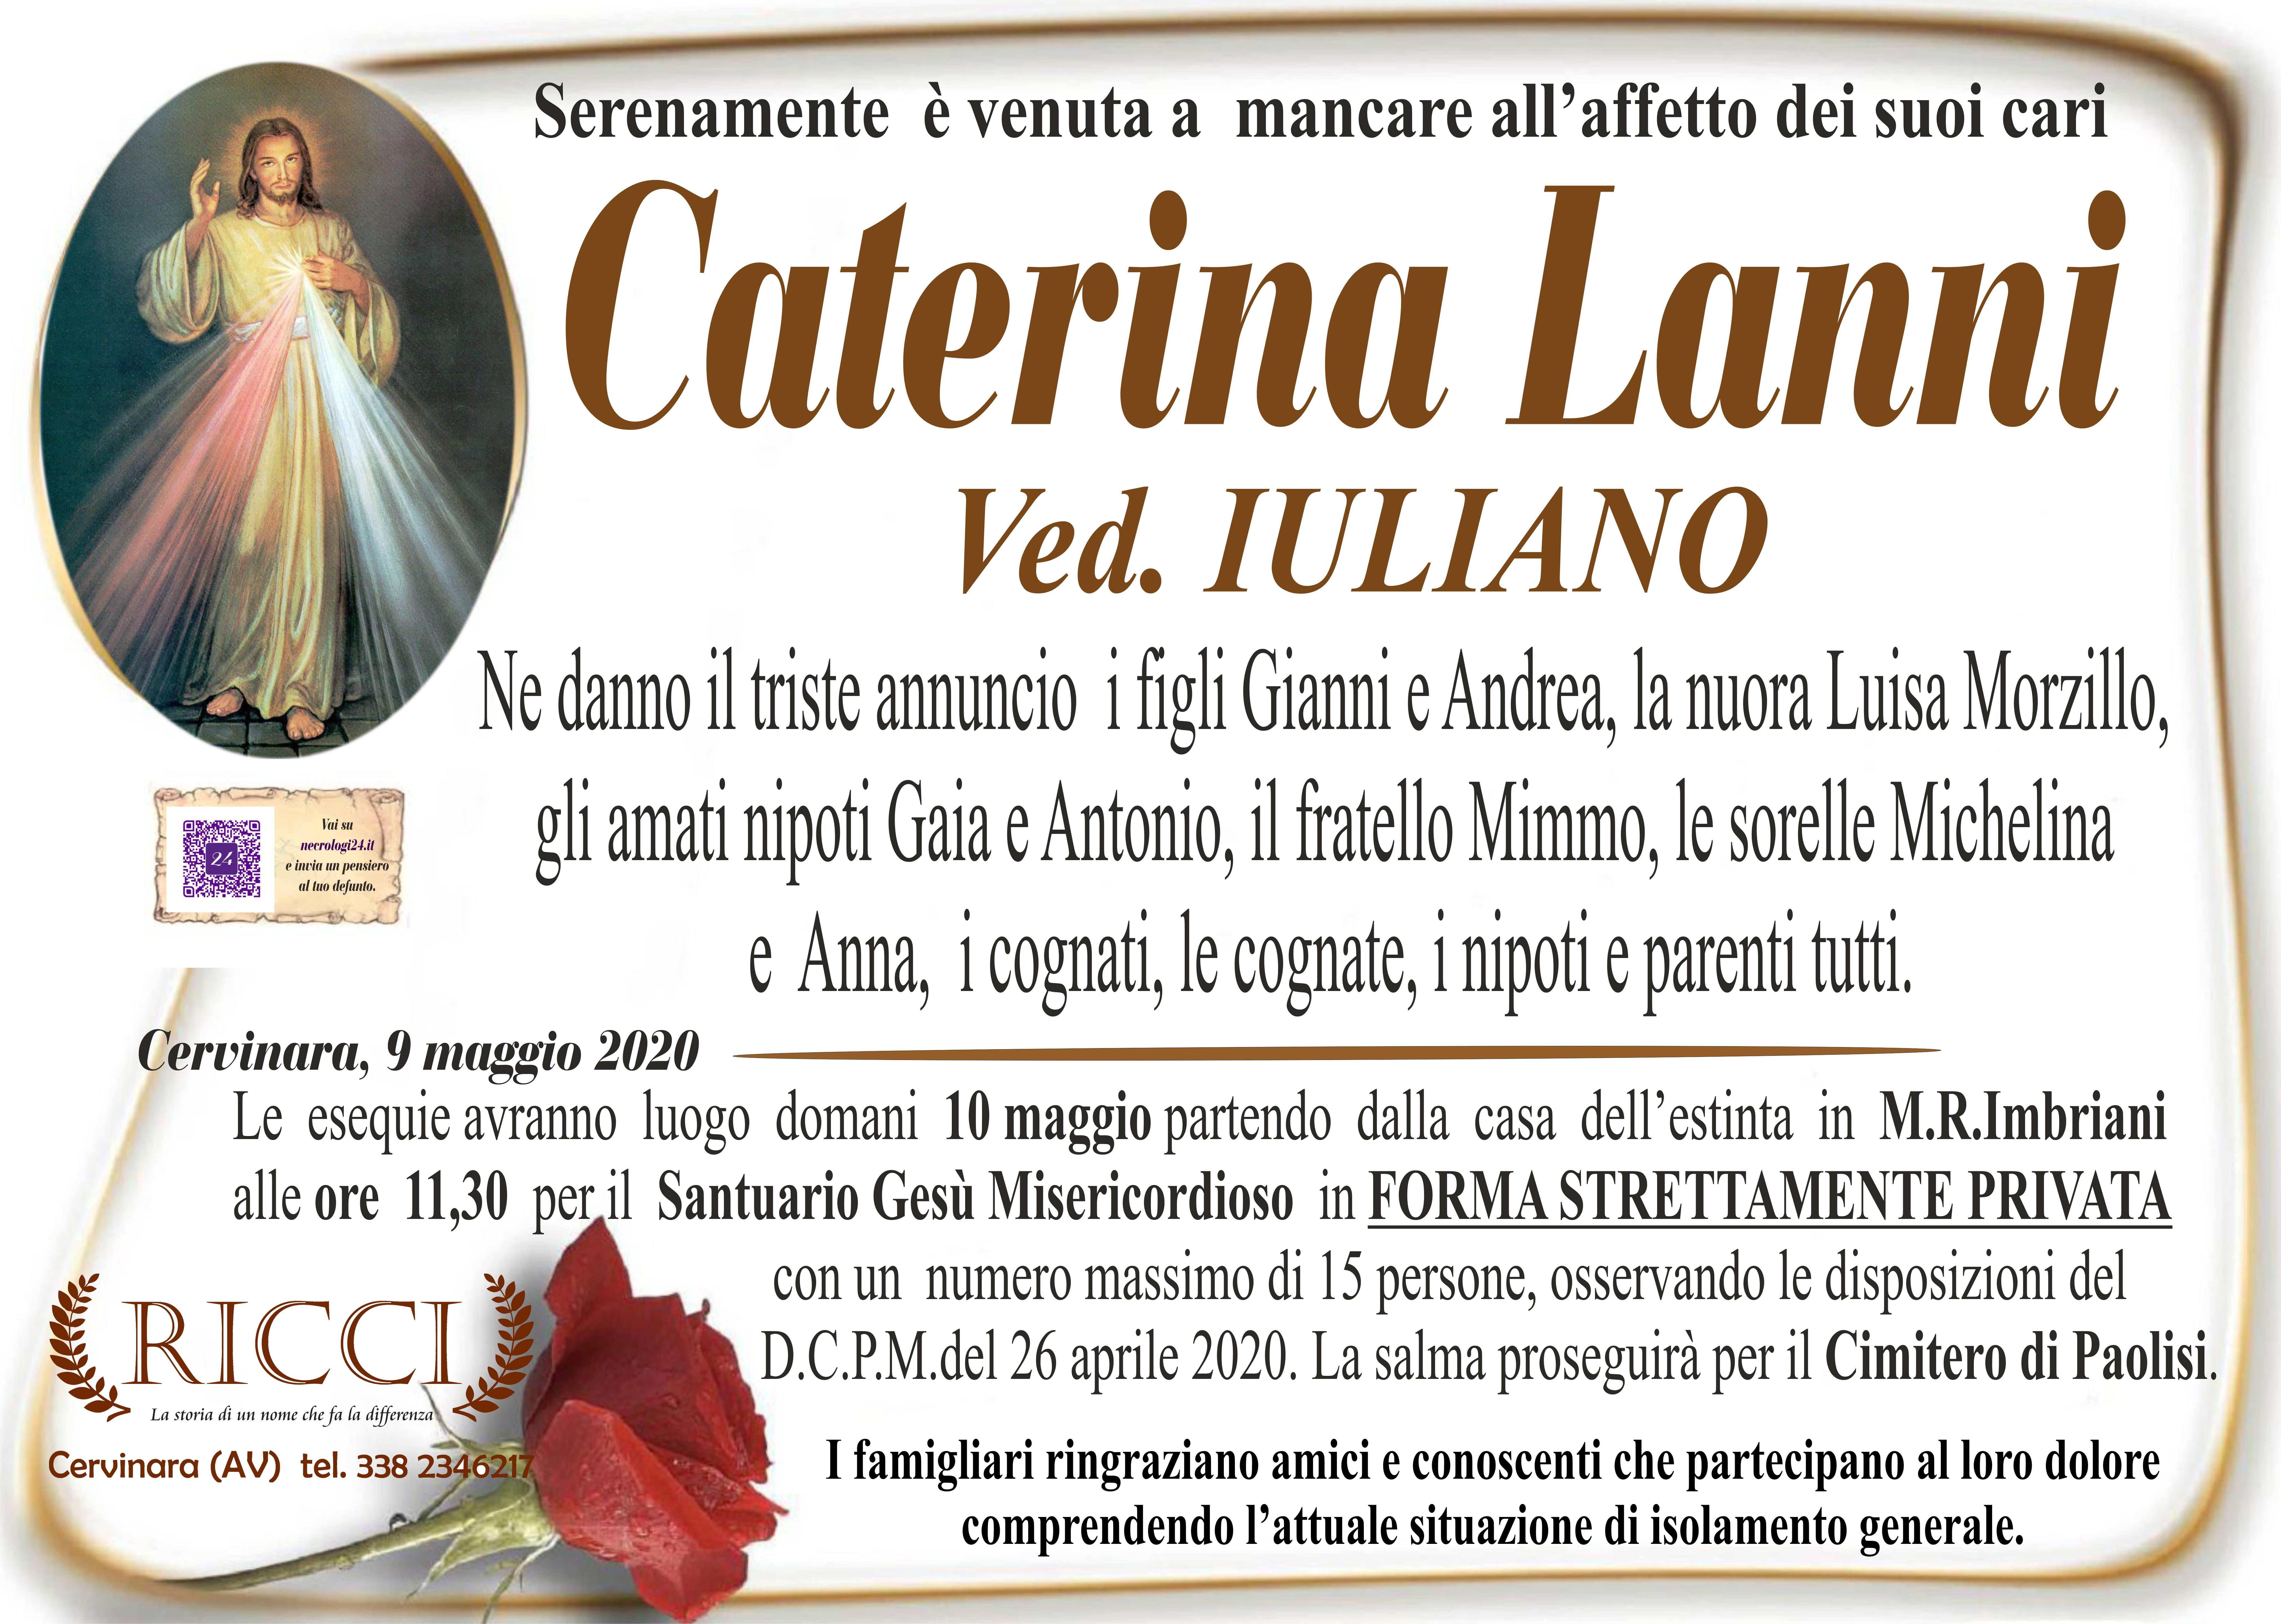 Caterina Lanni